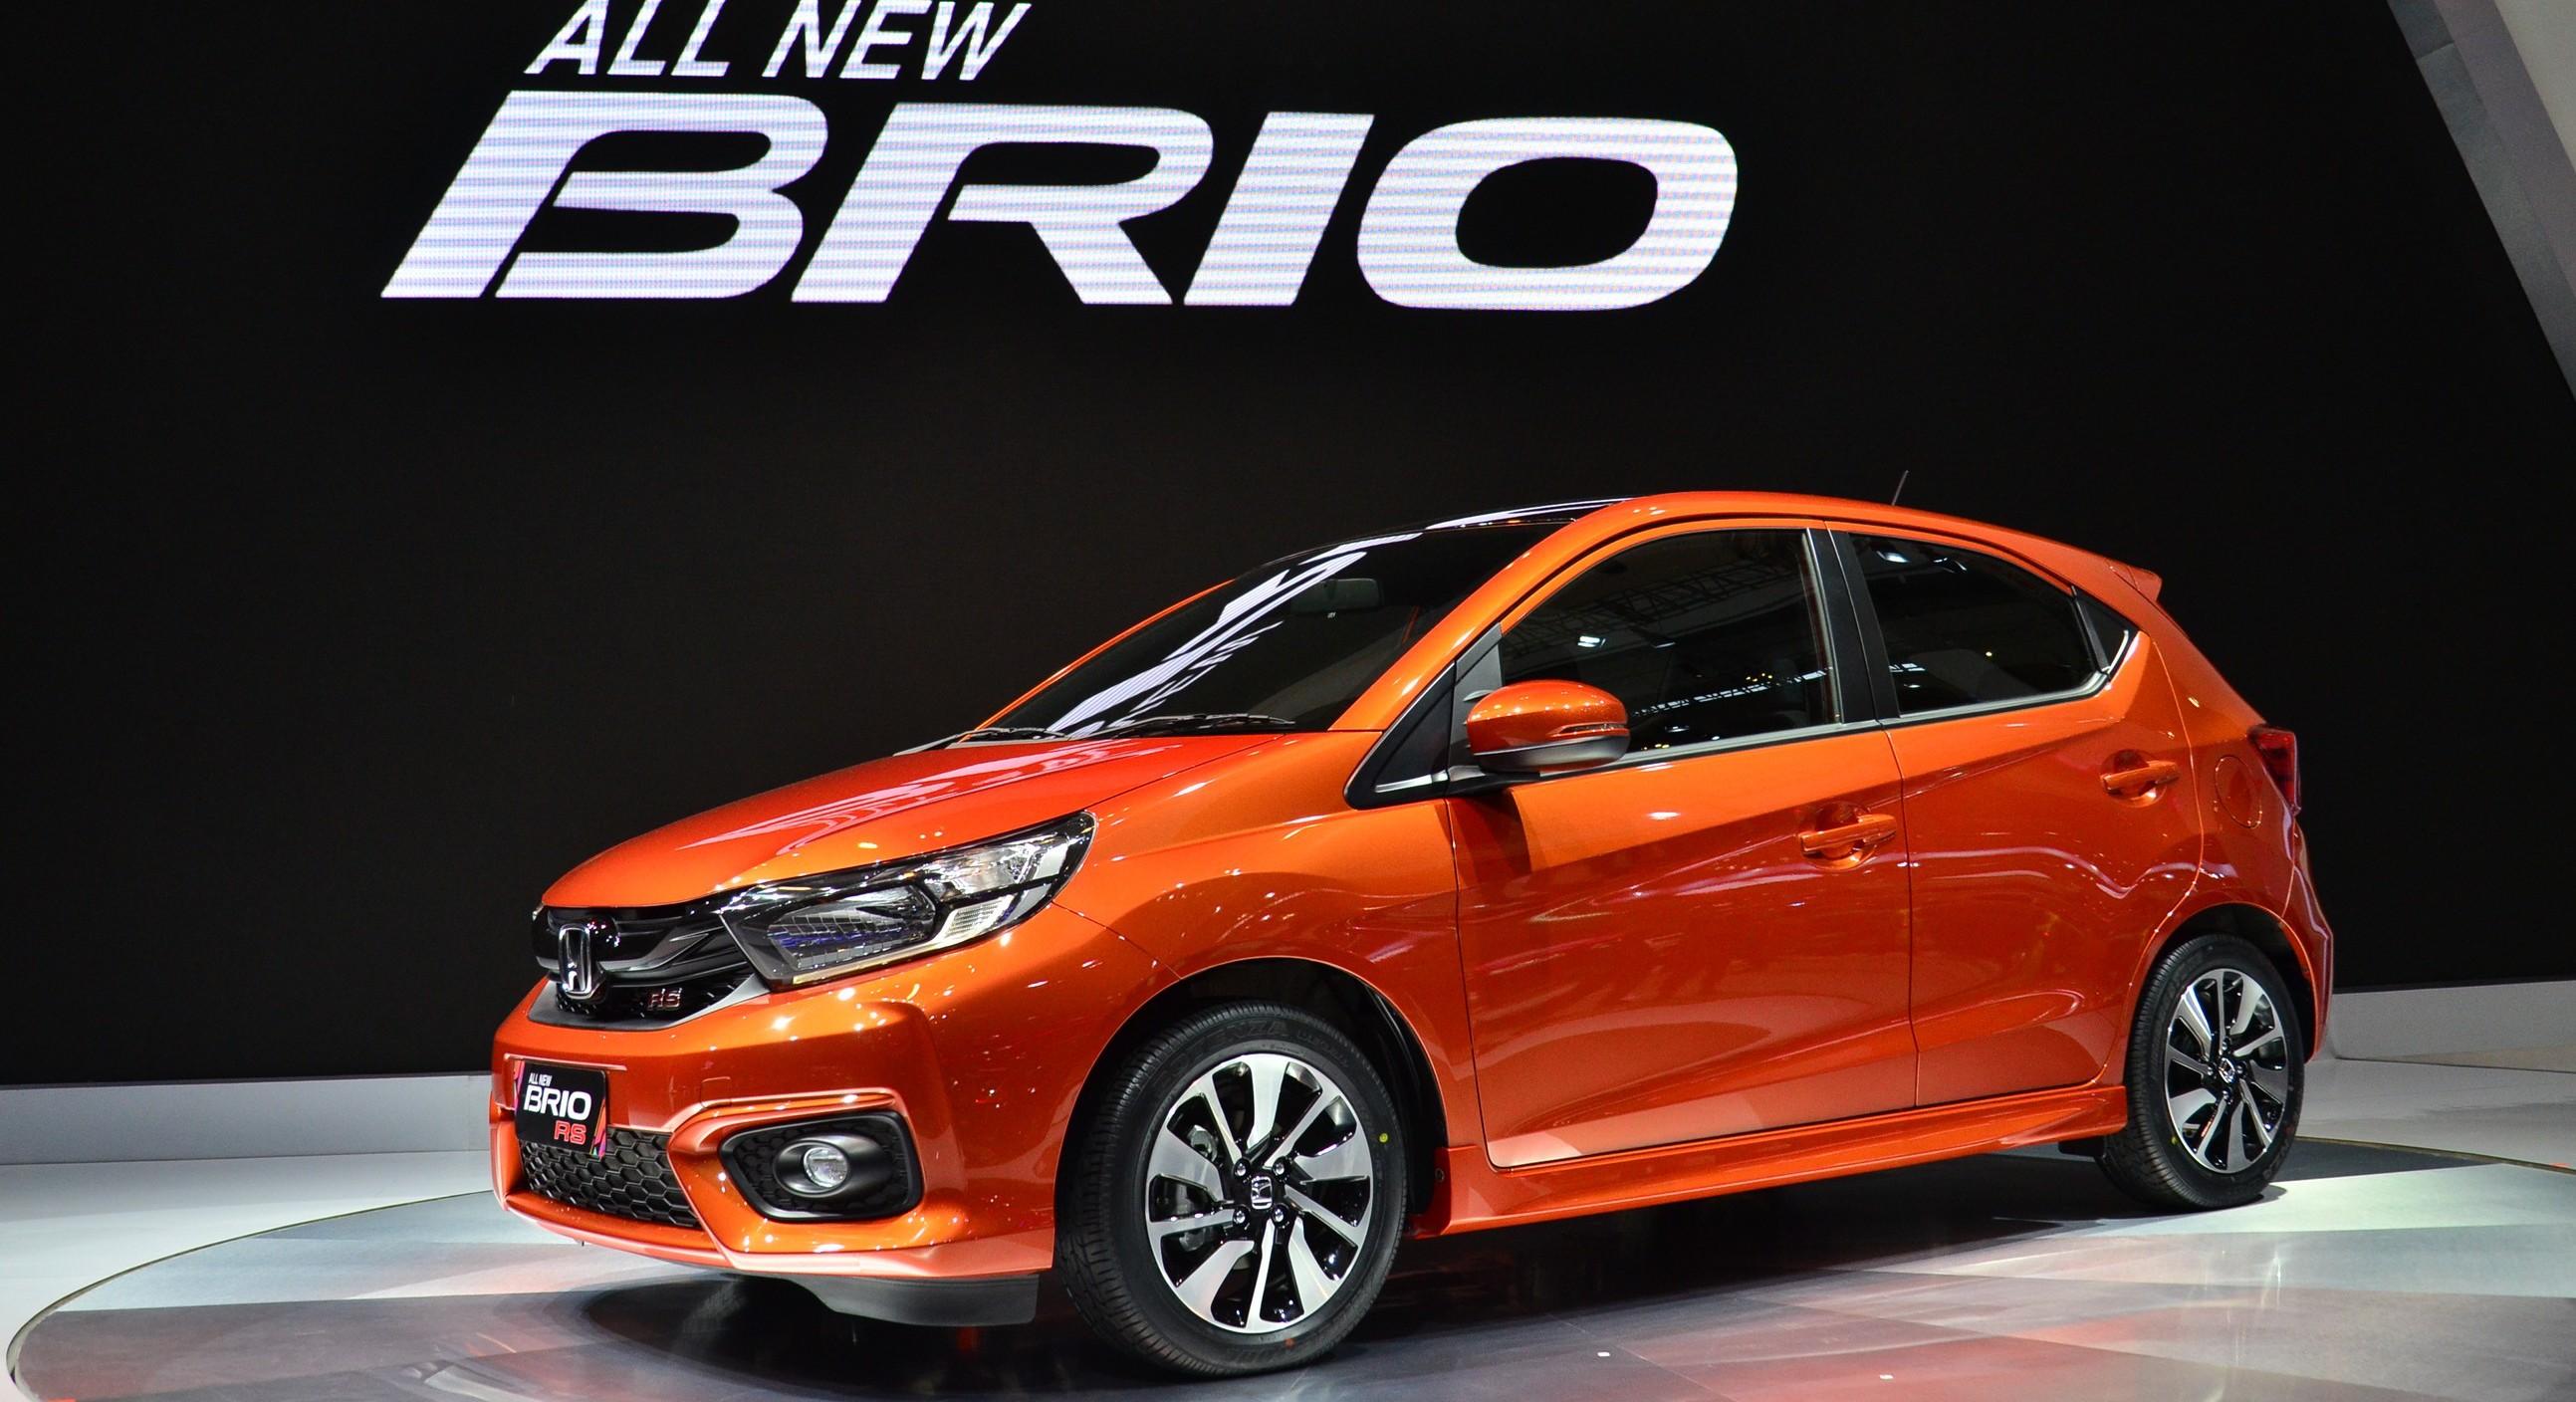 7 Bekal All New Honda Brio Dongkel Posisi Suzuki Ignis